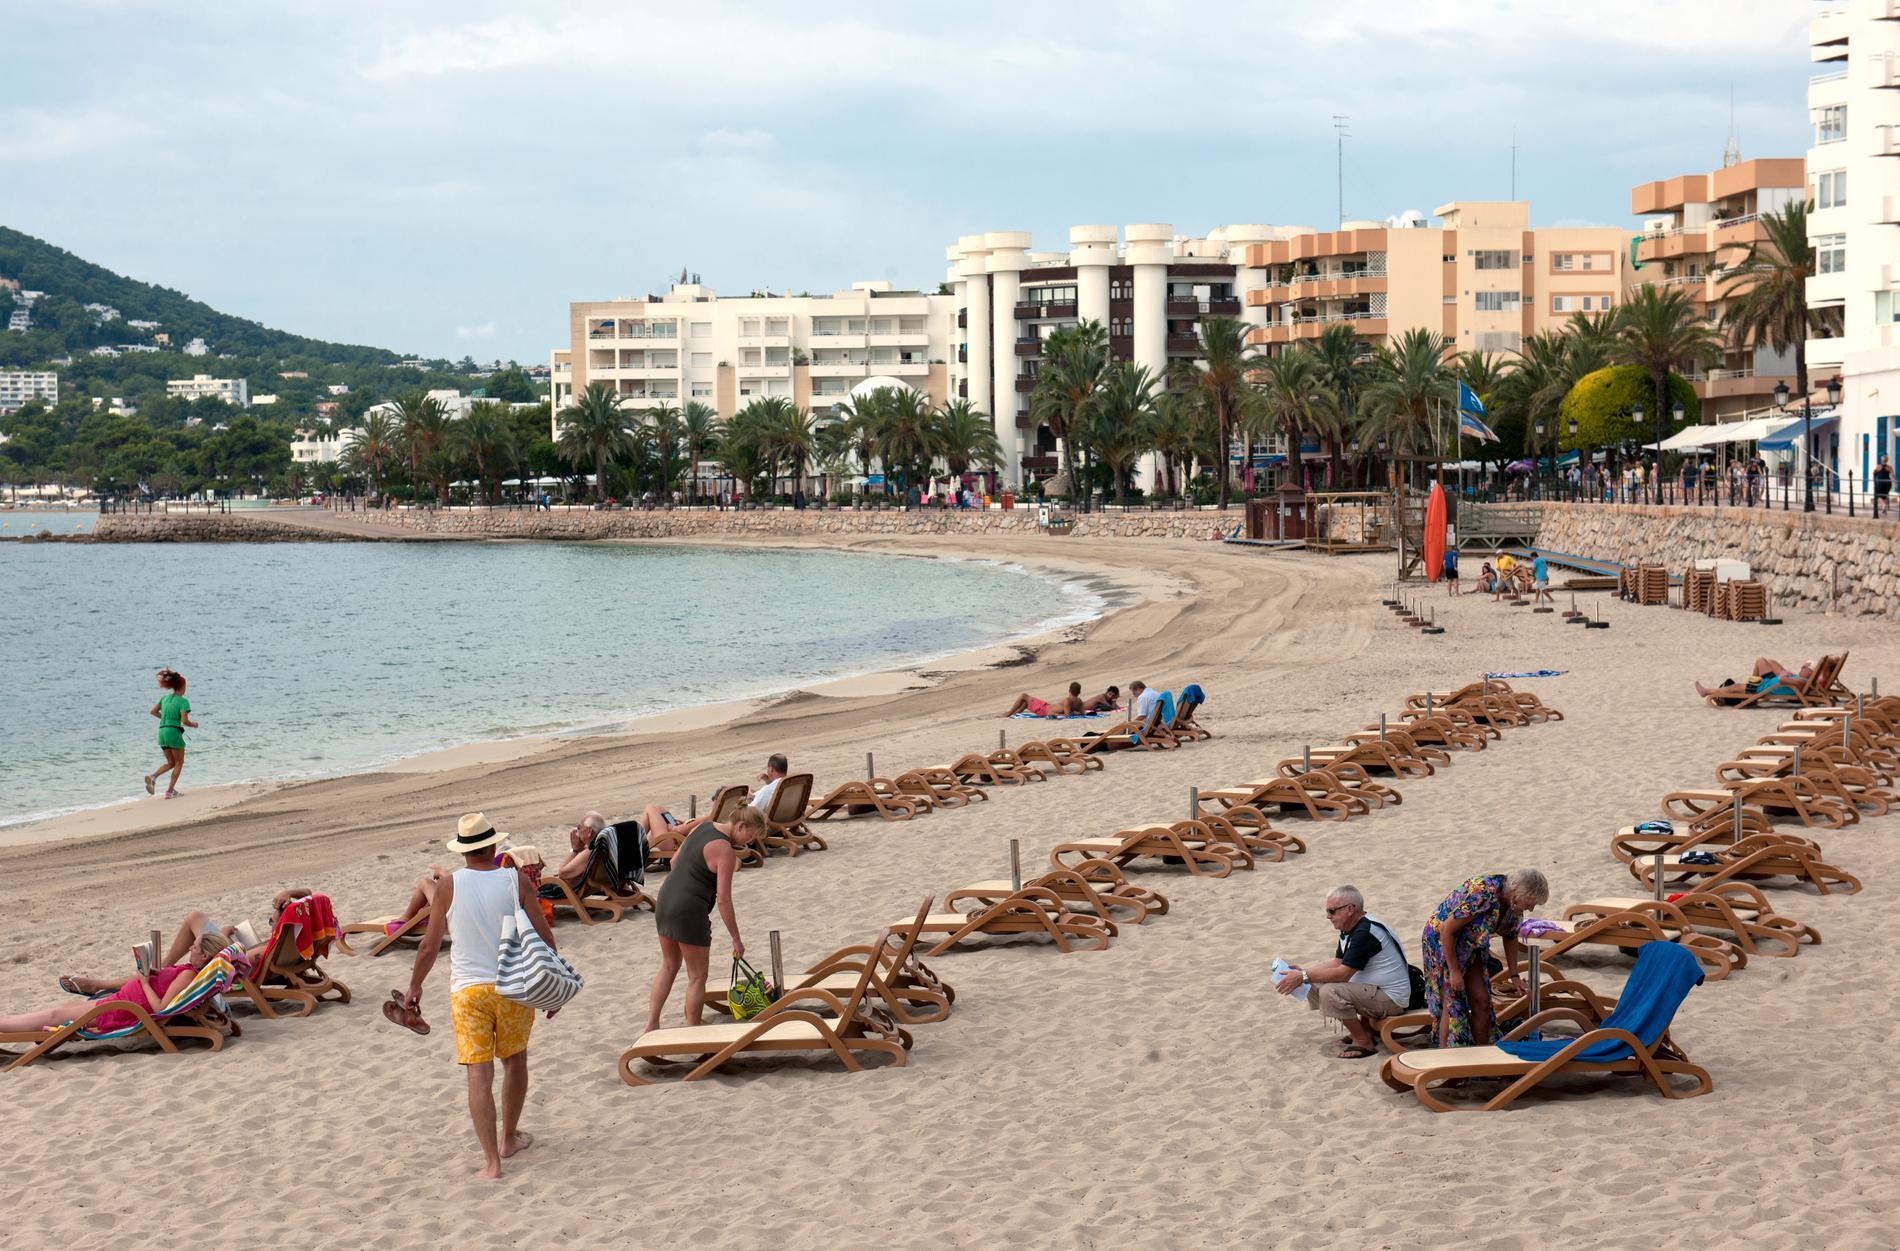 Stranden i Santa Eulalia på Ibiza.